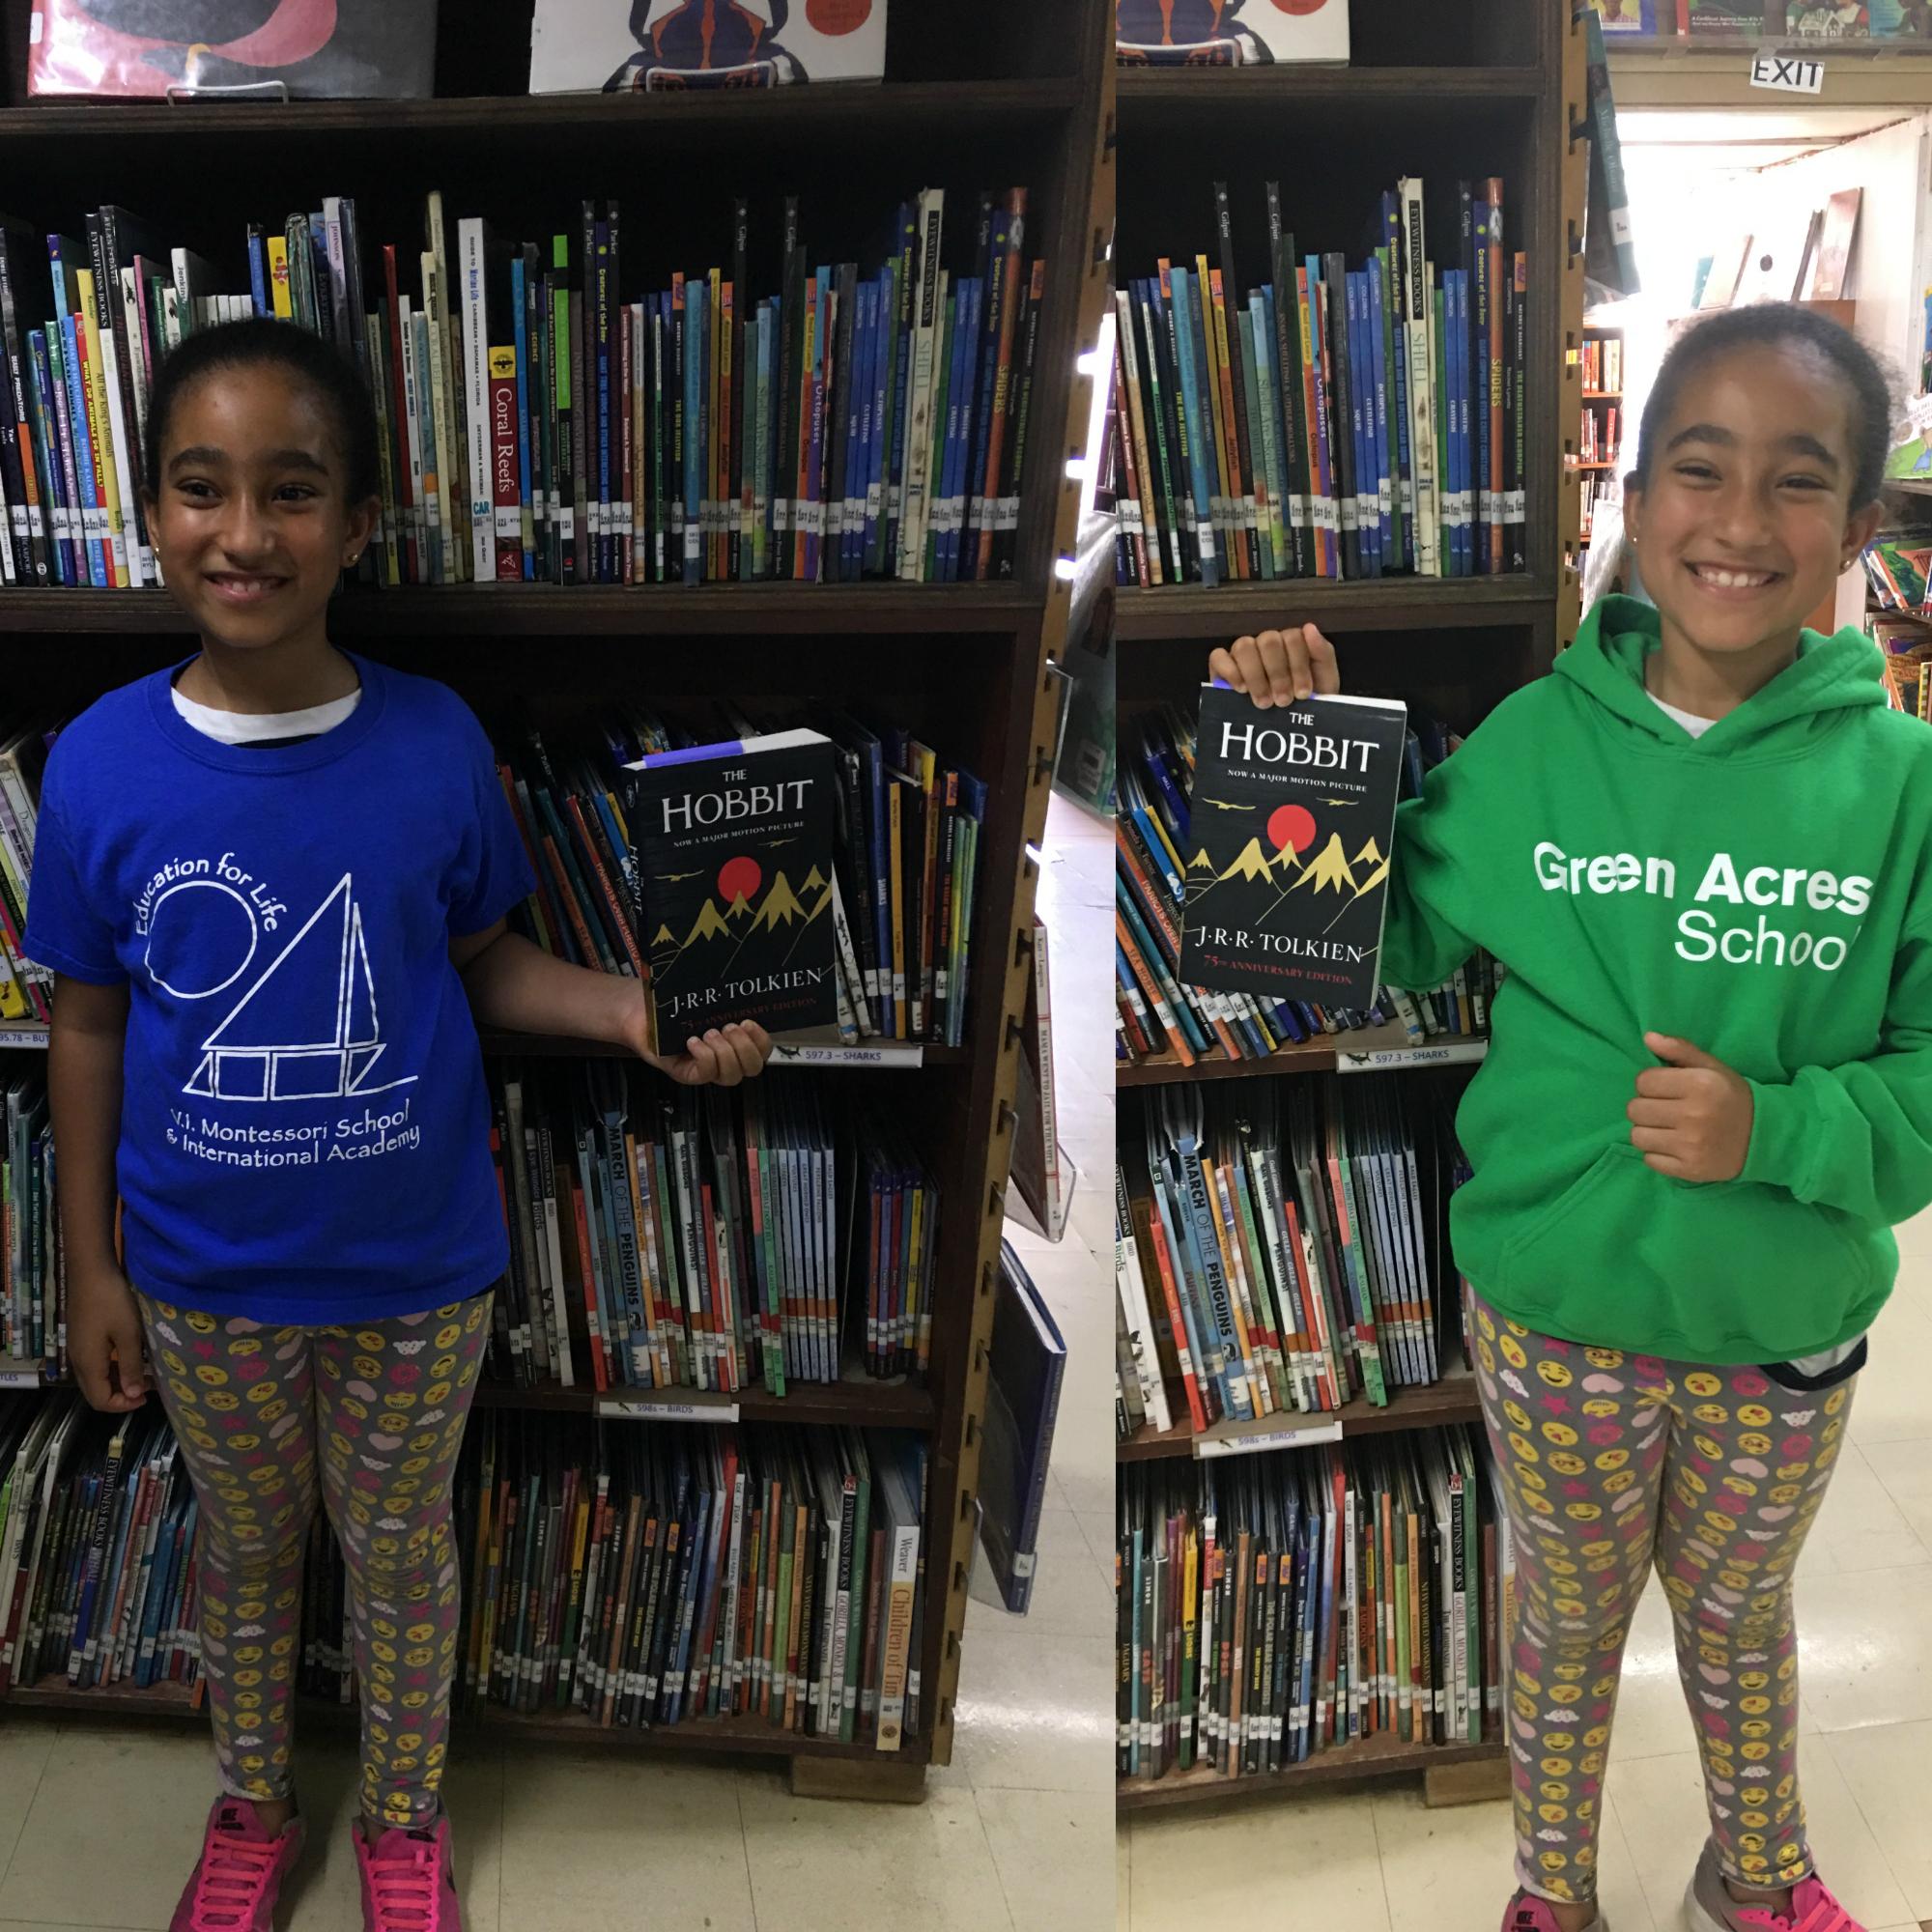 Lexi Harris representing both VIMSIA and Green Acres School